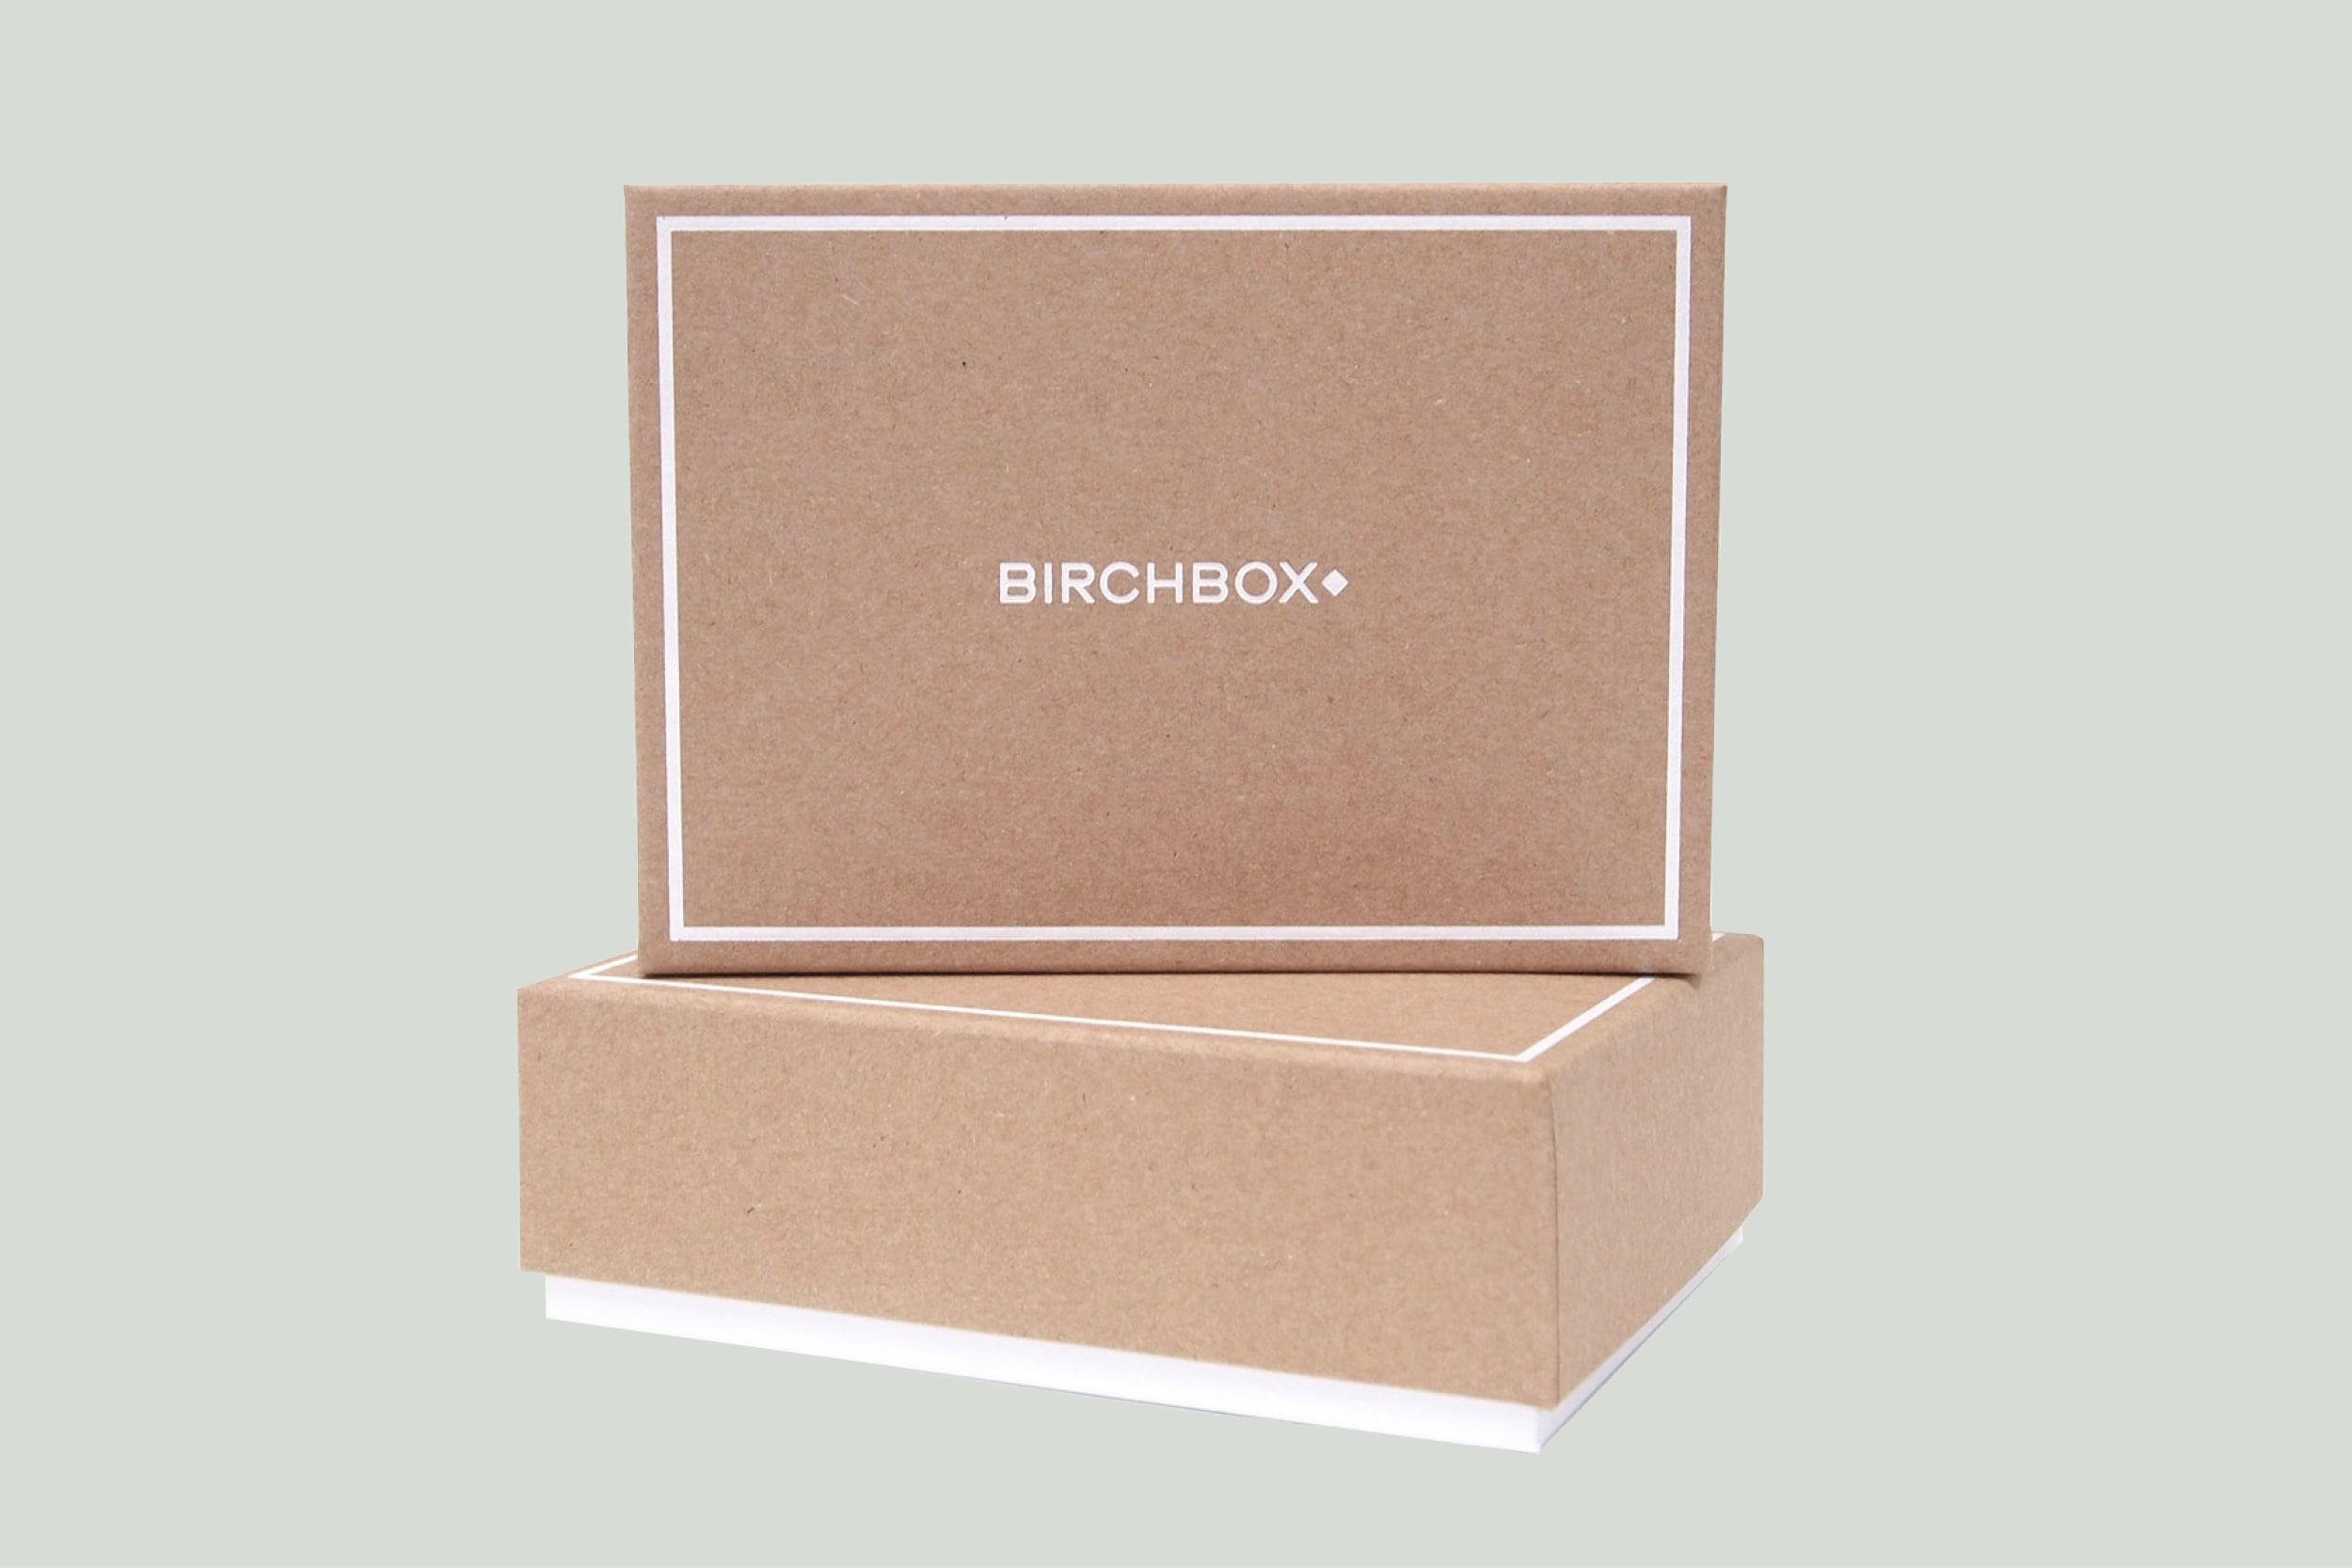 femke_nouters-box-packaging-design